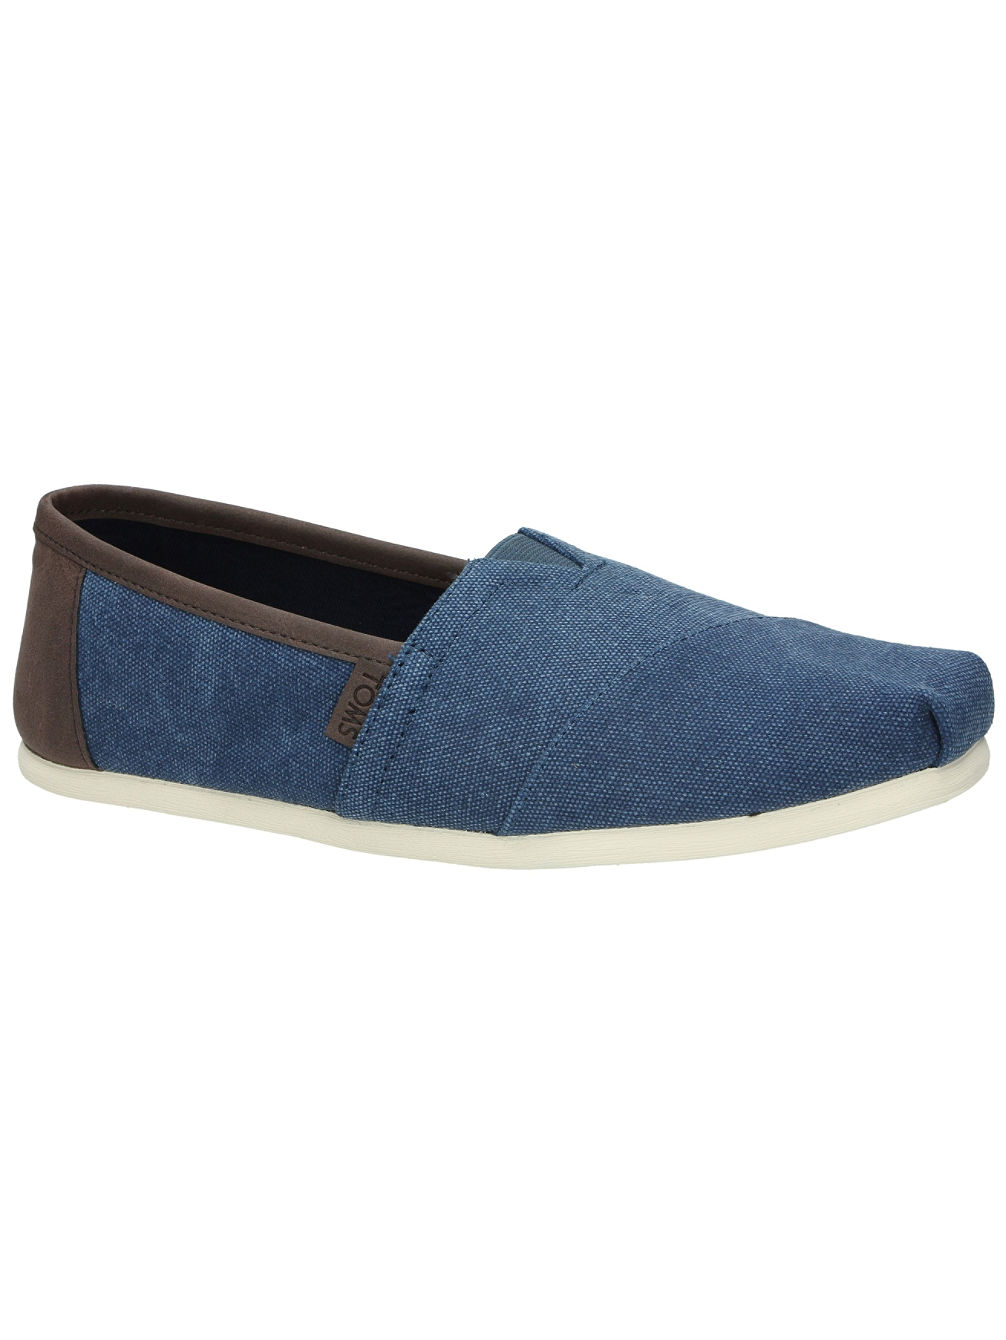 toms-seasonal-classic-slippers